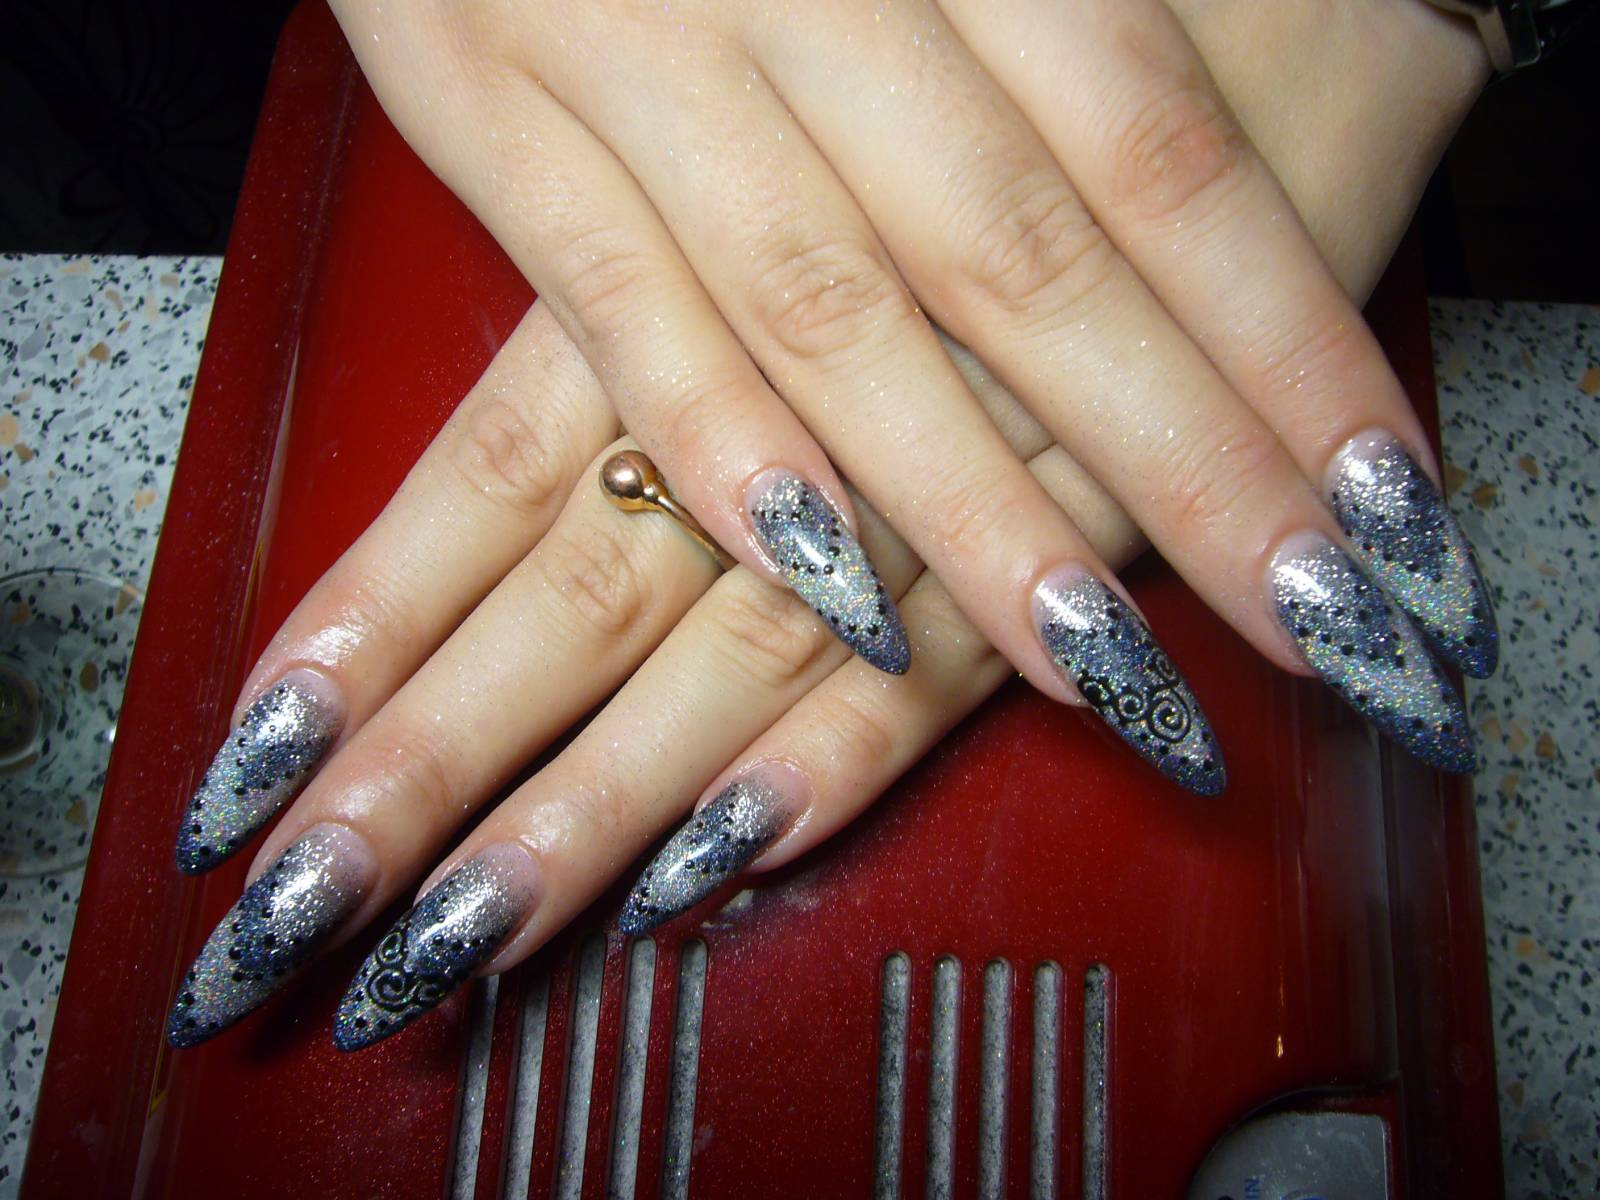 Наращивание ногтей с серебром фото